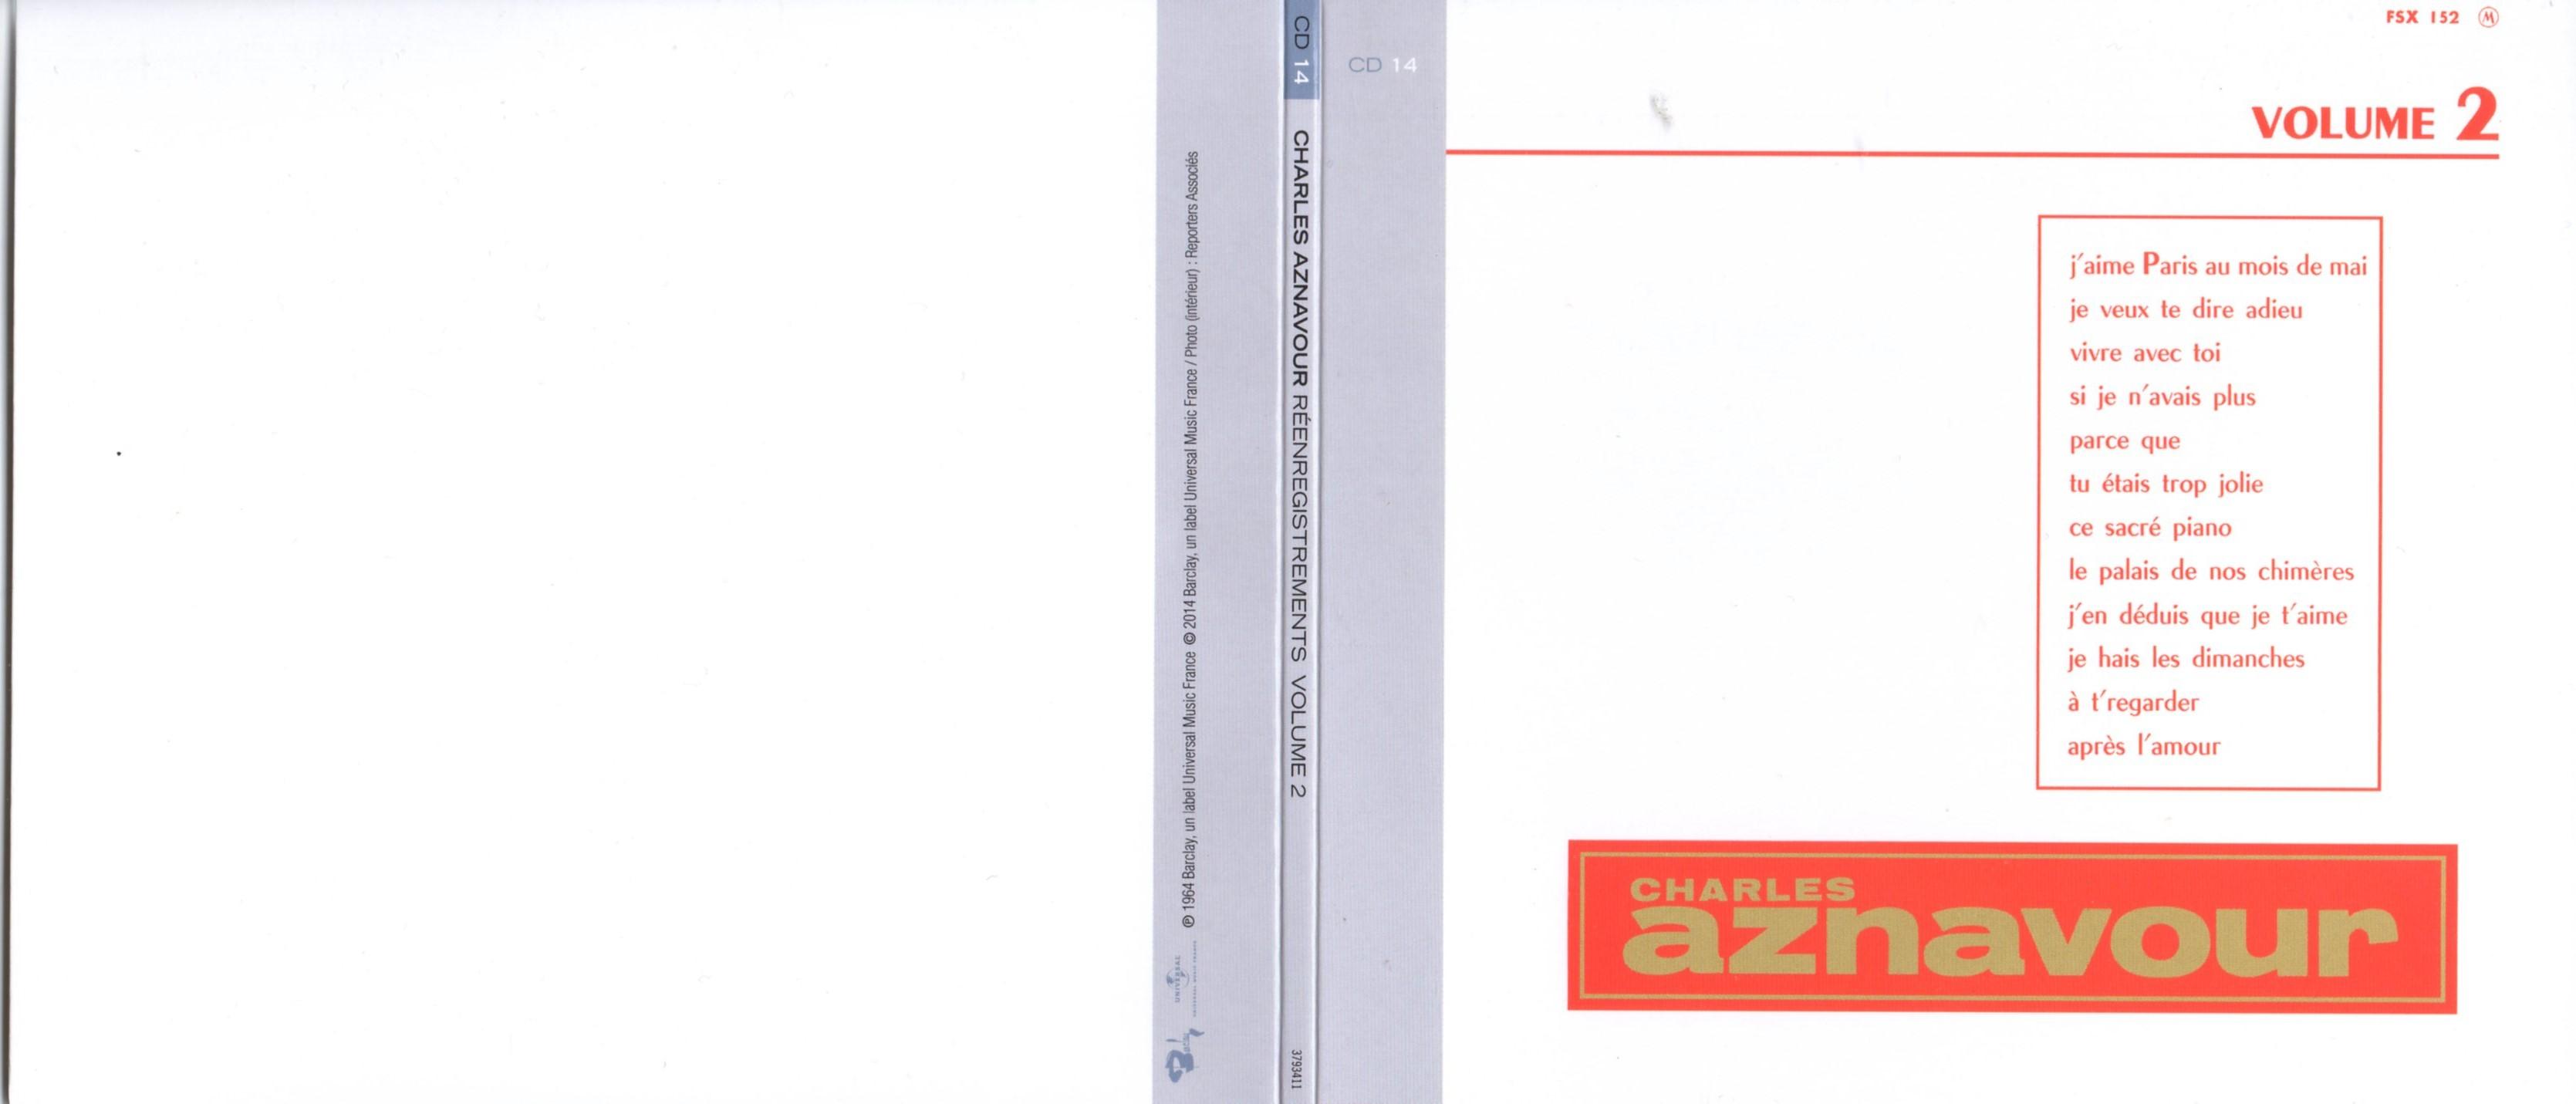 CHARLES AZNAVOUR - Réenregistrements Columbia Volume 2 (1964) Gatefold Card board sleeve Replica - CD